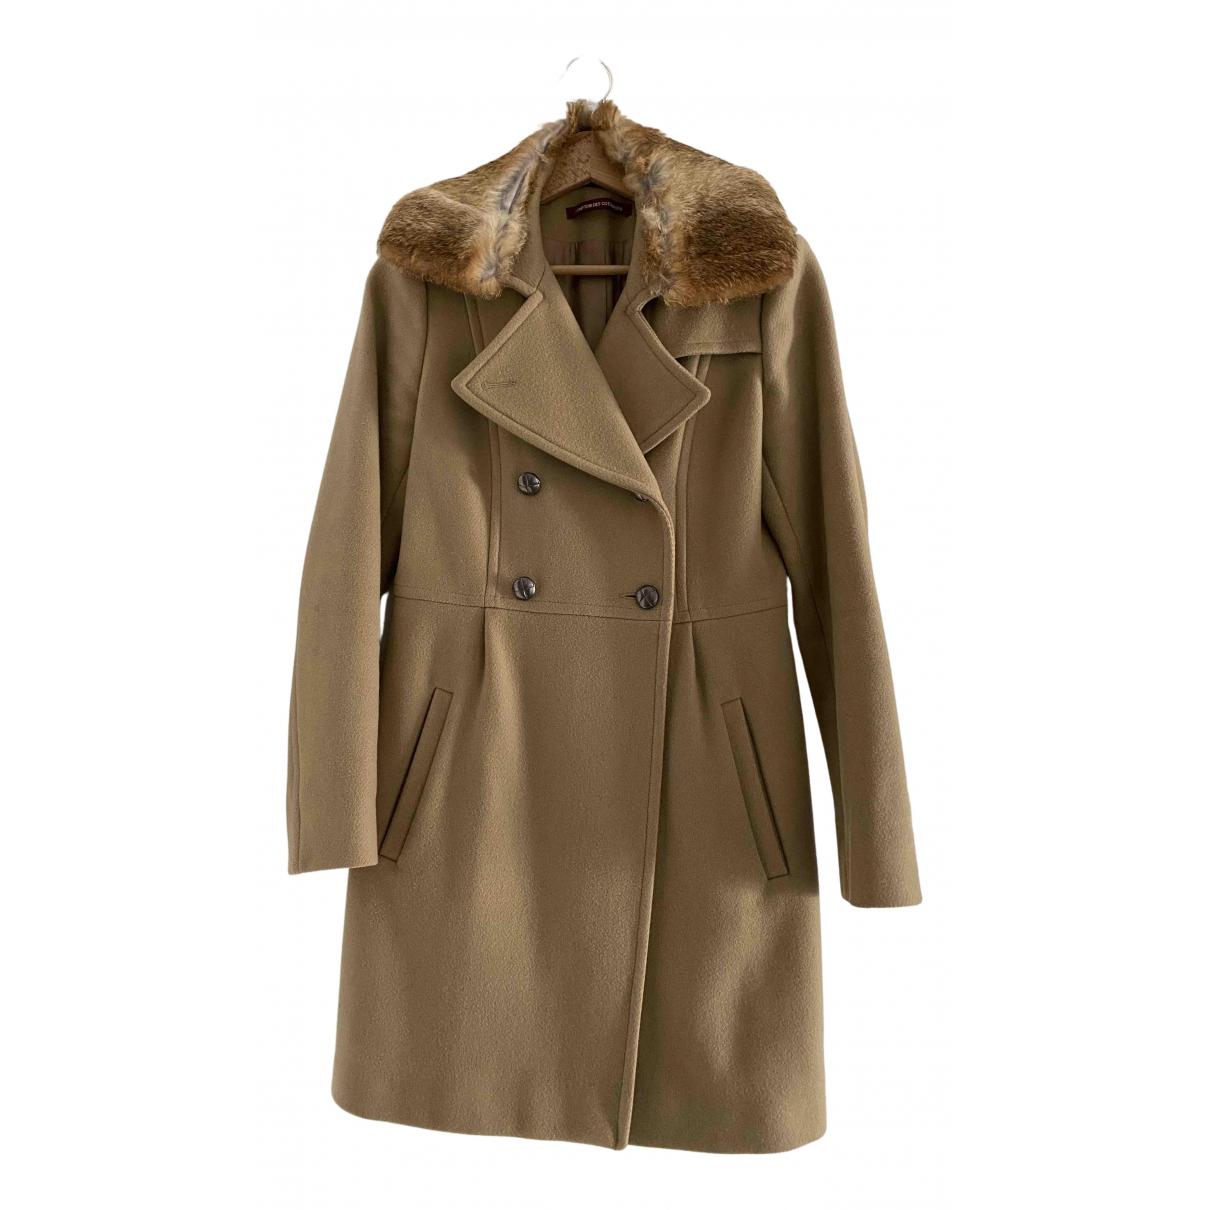 Comptoir Des Cotonniers N Beige Wool coat for Women 36 FR